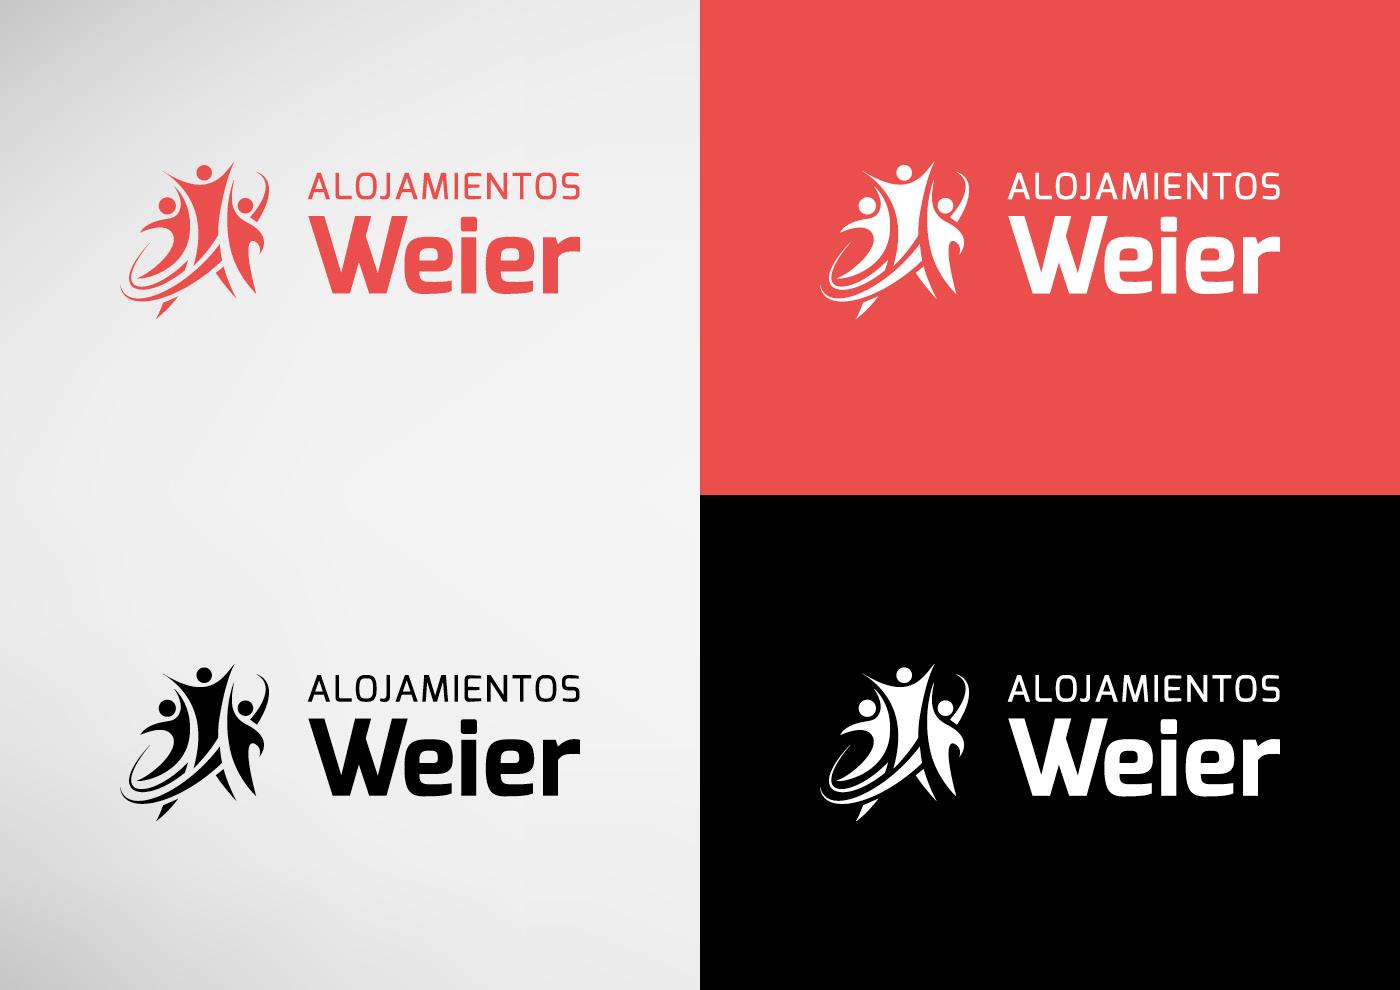 Grupo Lofrivall - Alojamientos Weier - logo - Ivan Diez